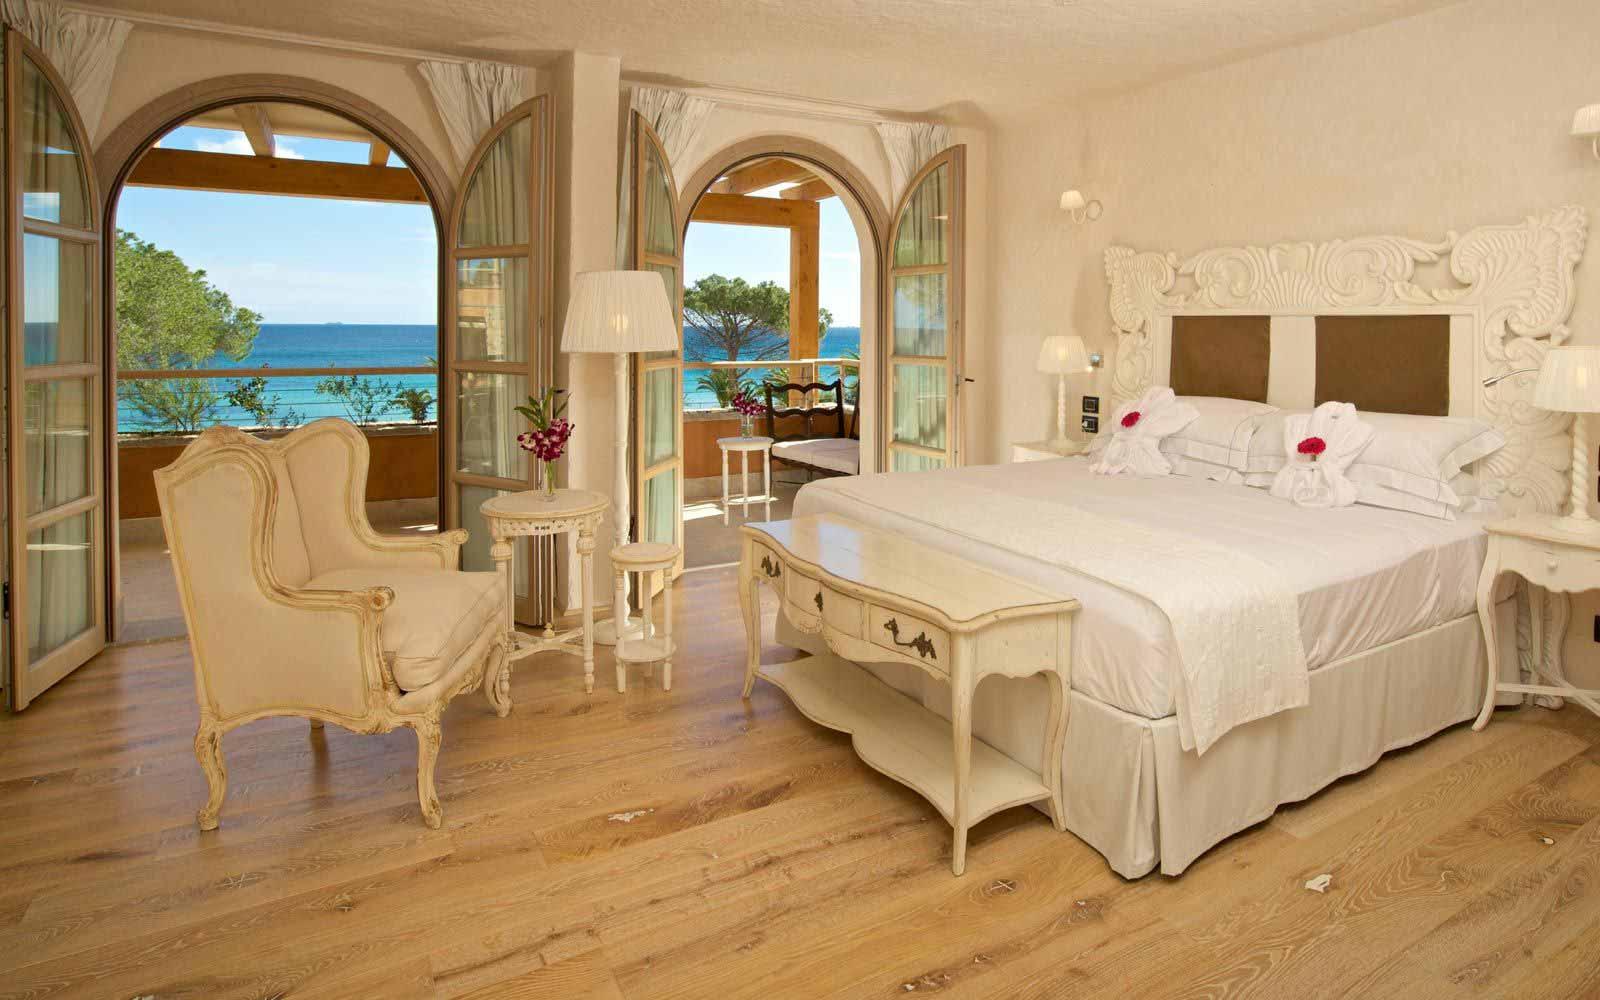 Junior suite at the Hotel Villa del Re